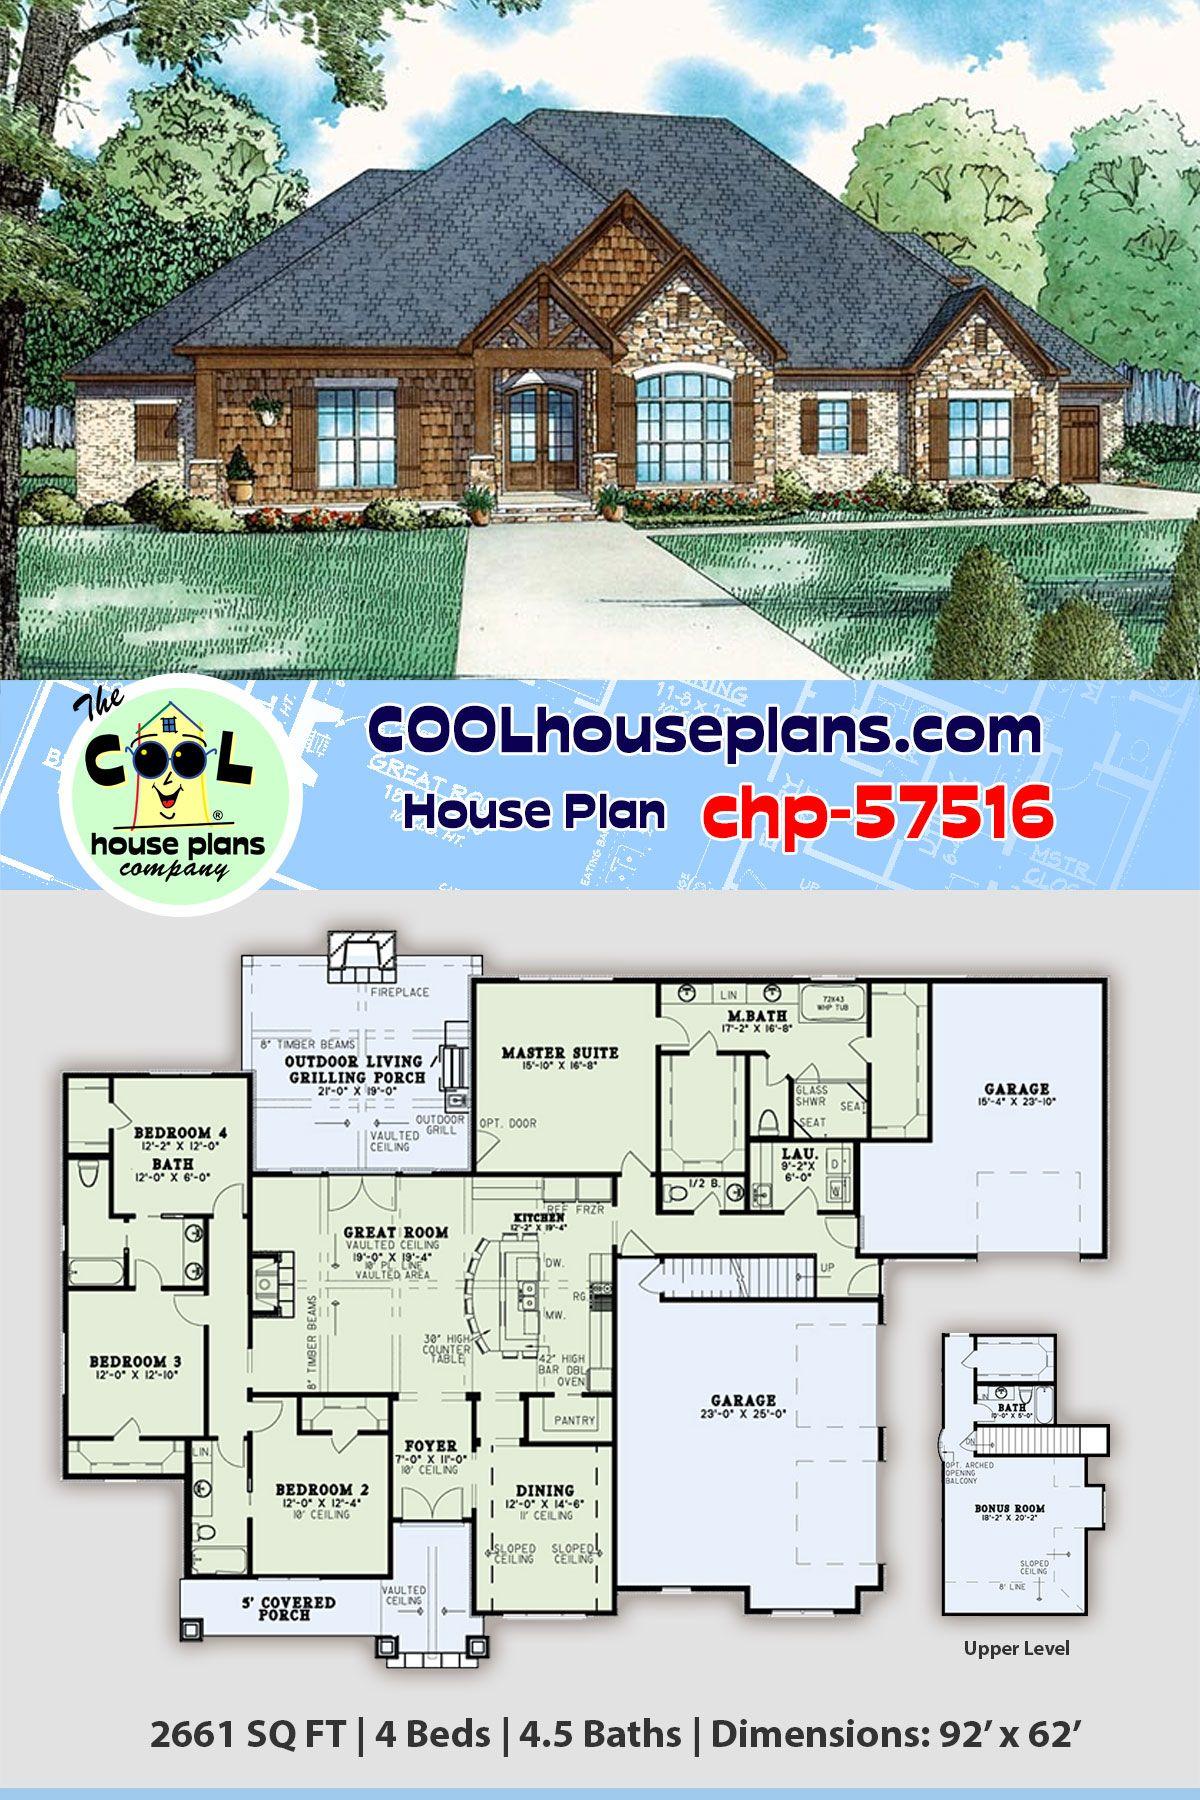 European Style House Plan 82356 With 4 Bed 5 Bath 3 Car Garage House Plans European House European House Plan